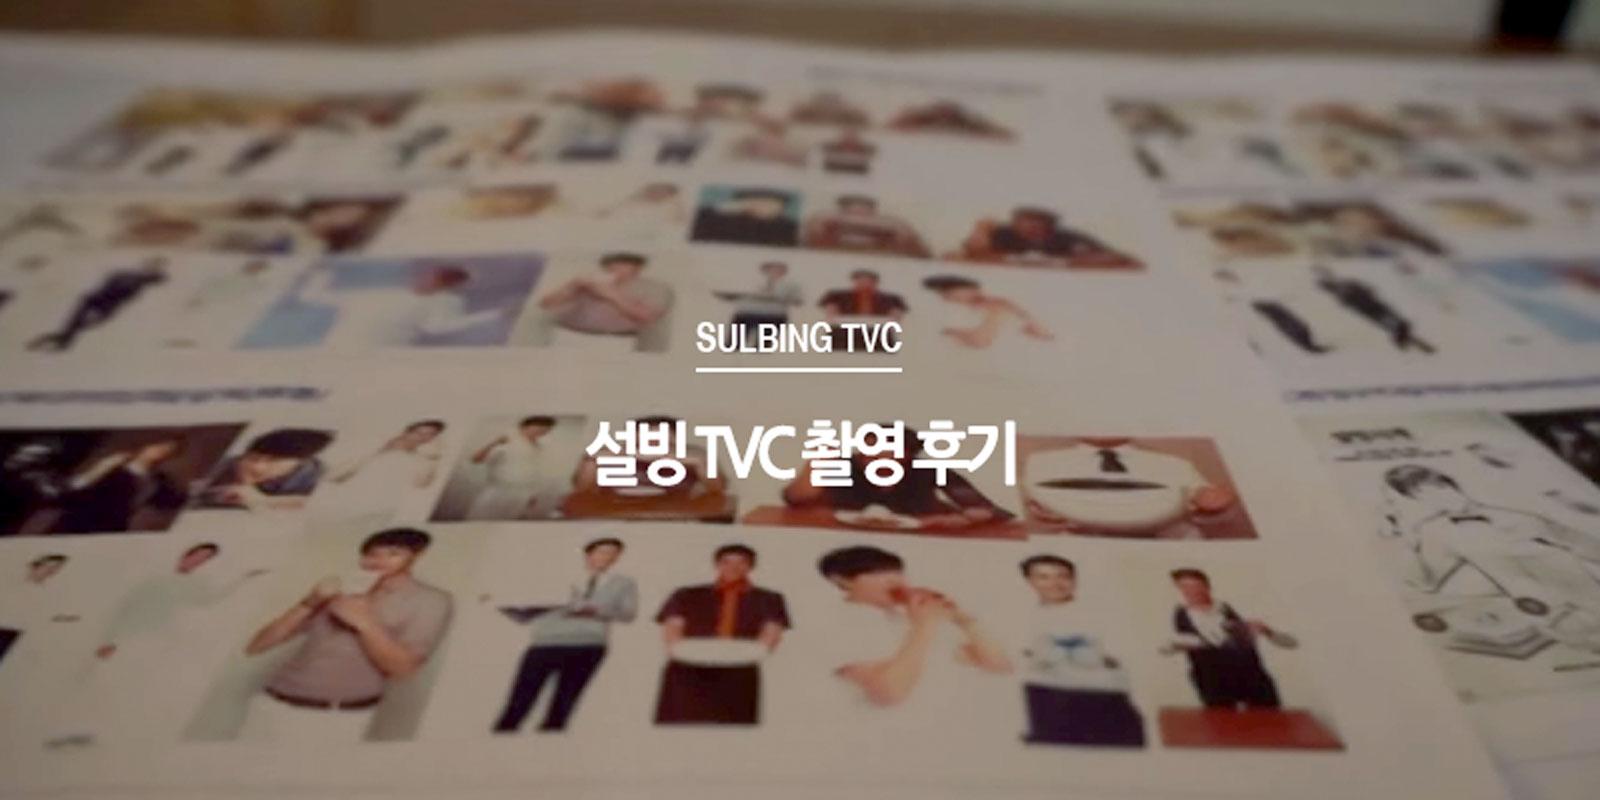 sulbing_video_1600-설빙TVC촬영후기-font33